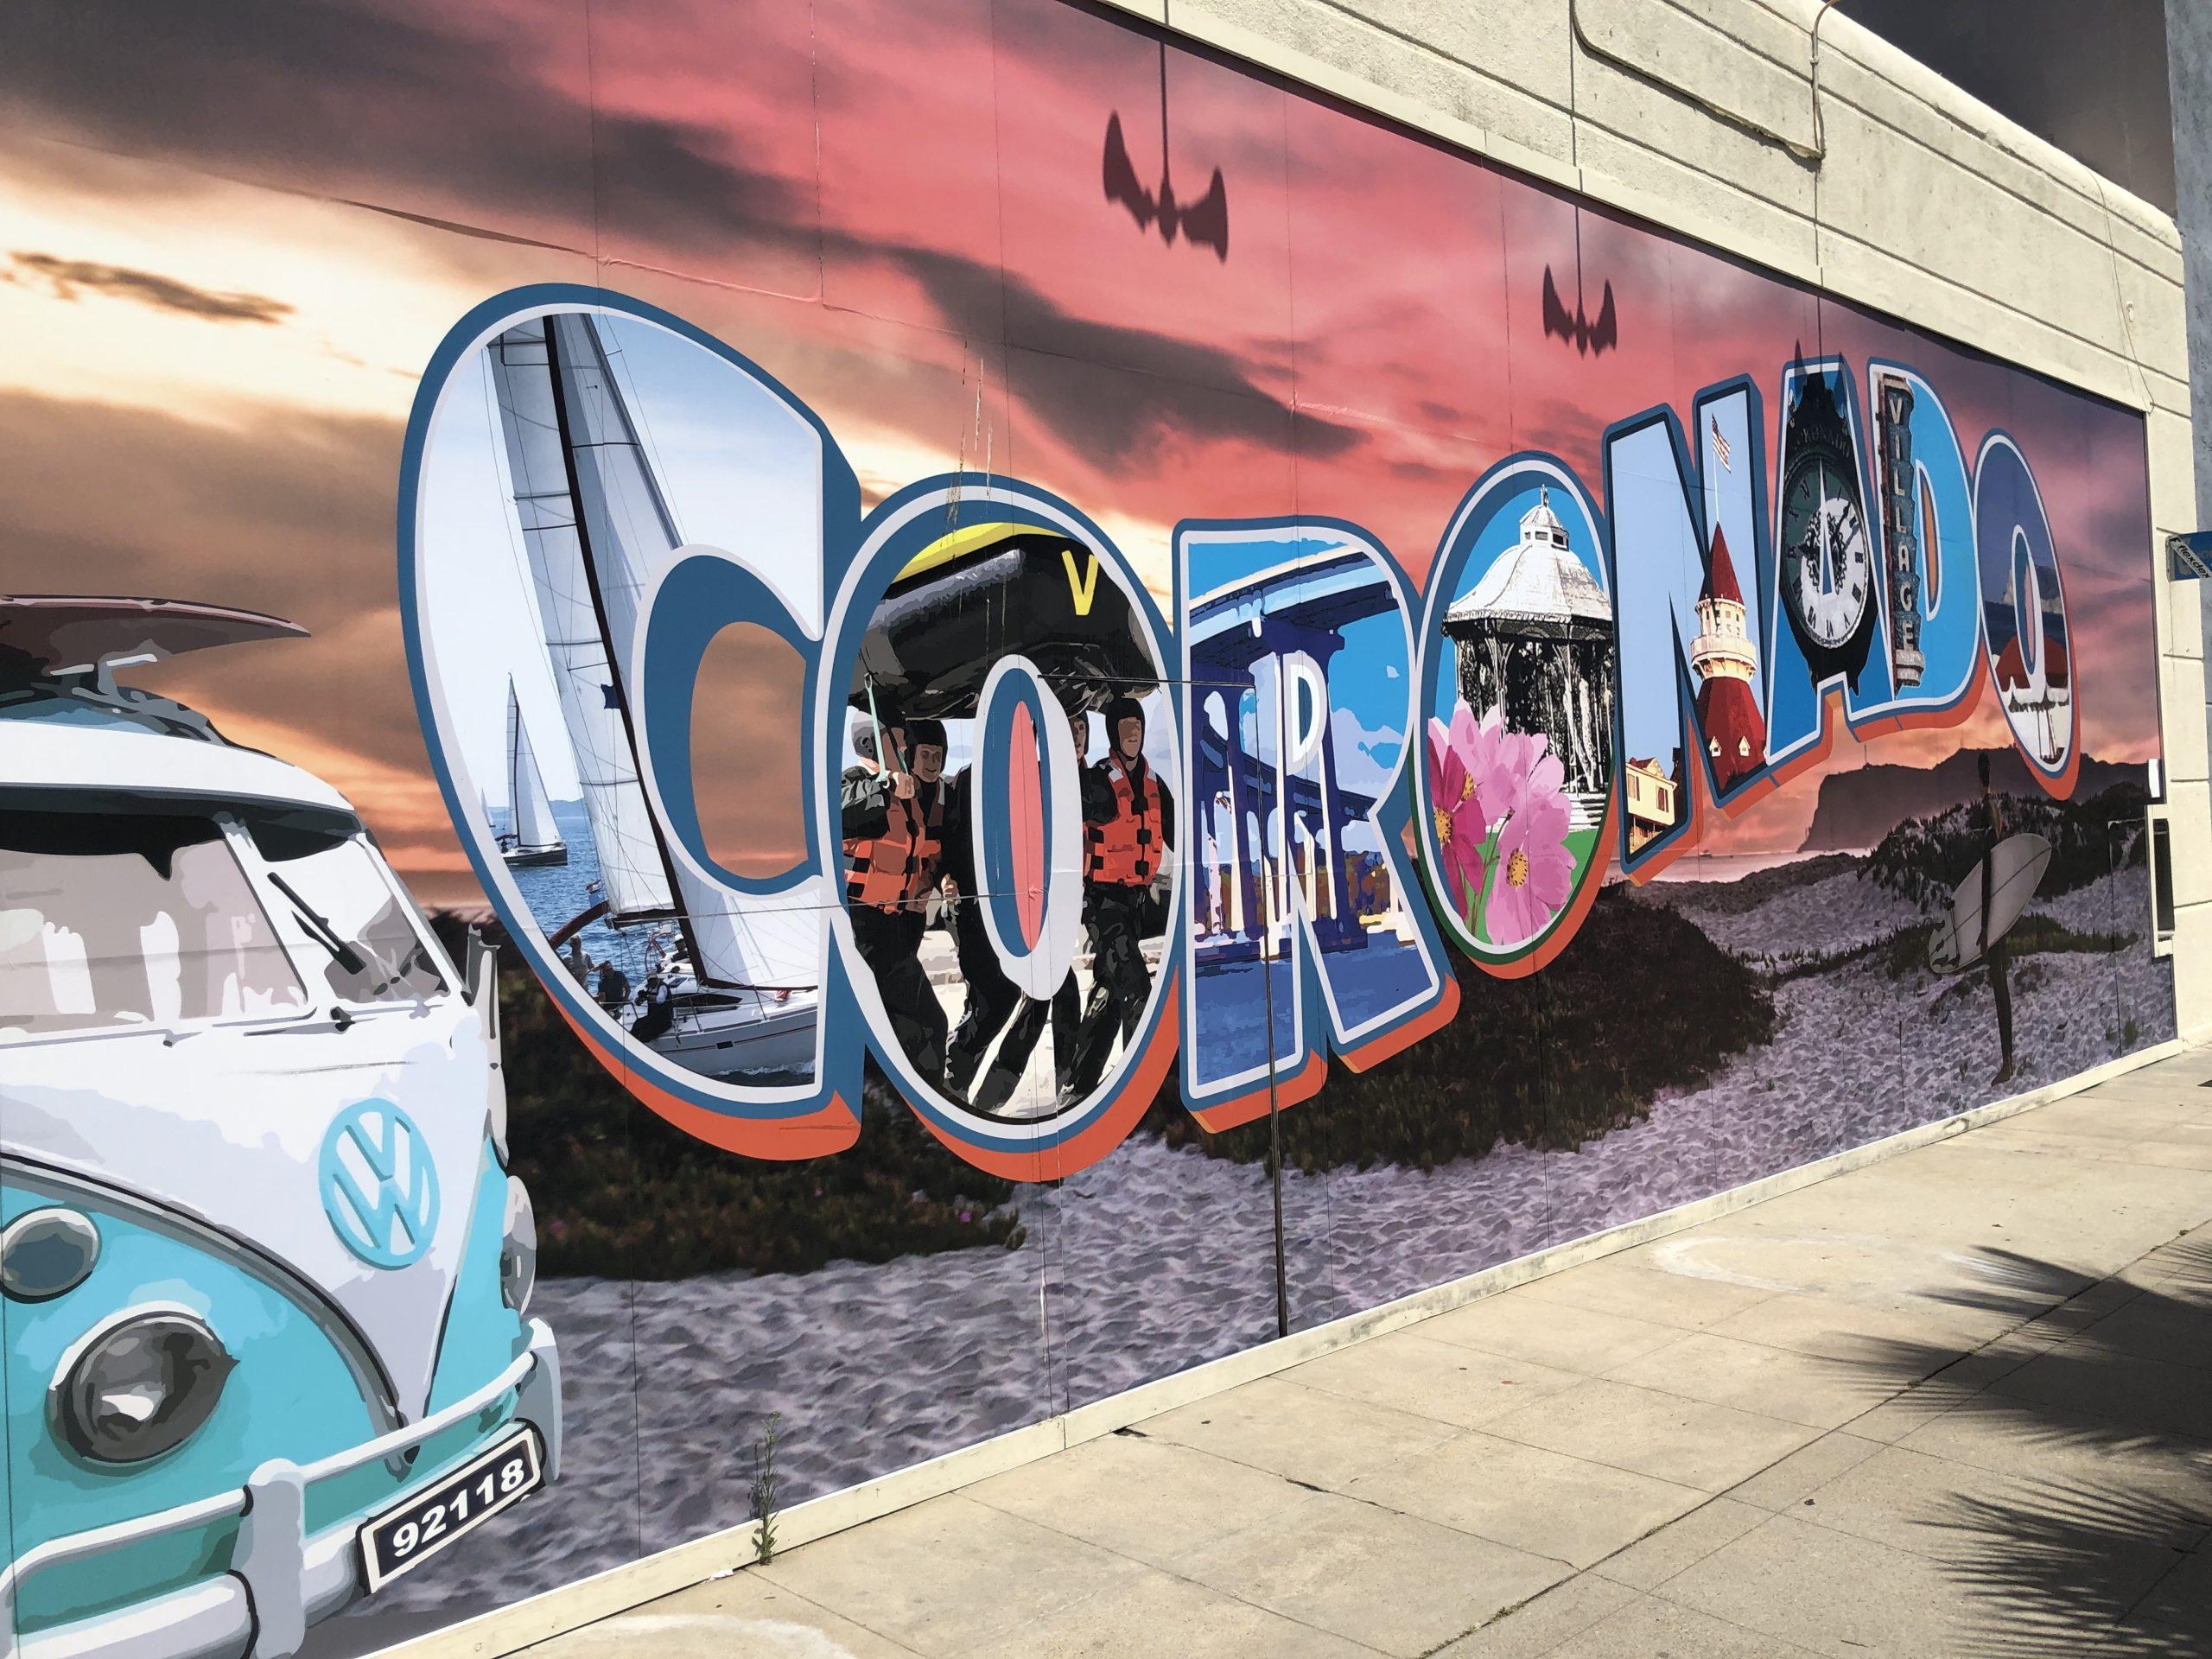 Coronado mural